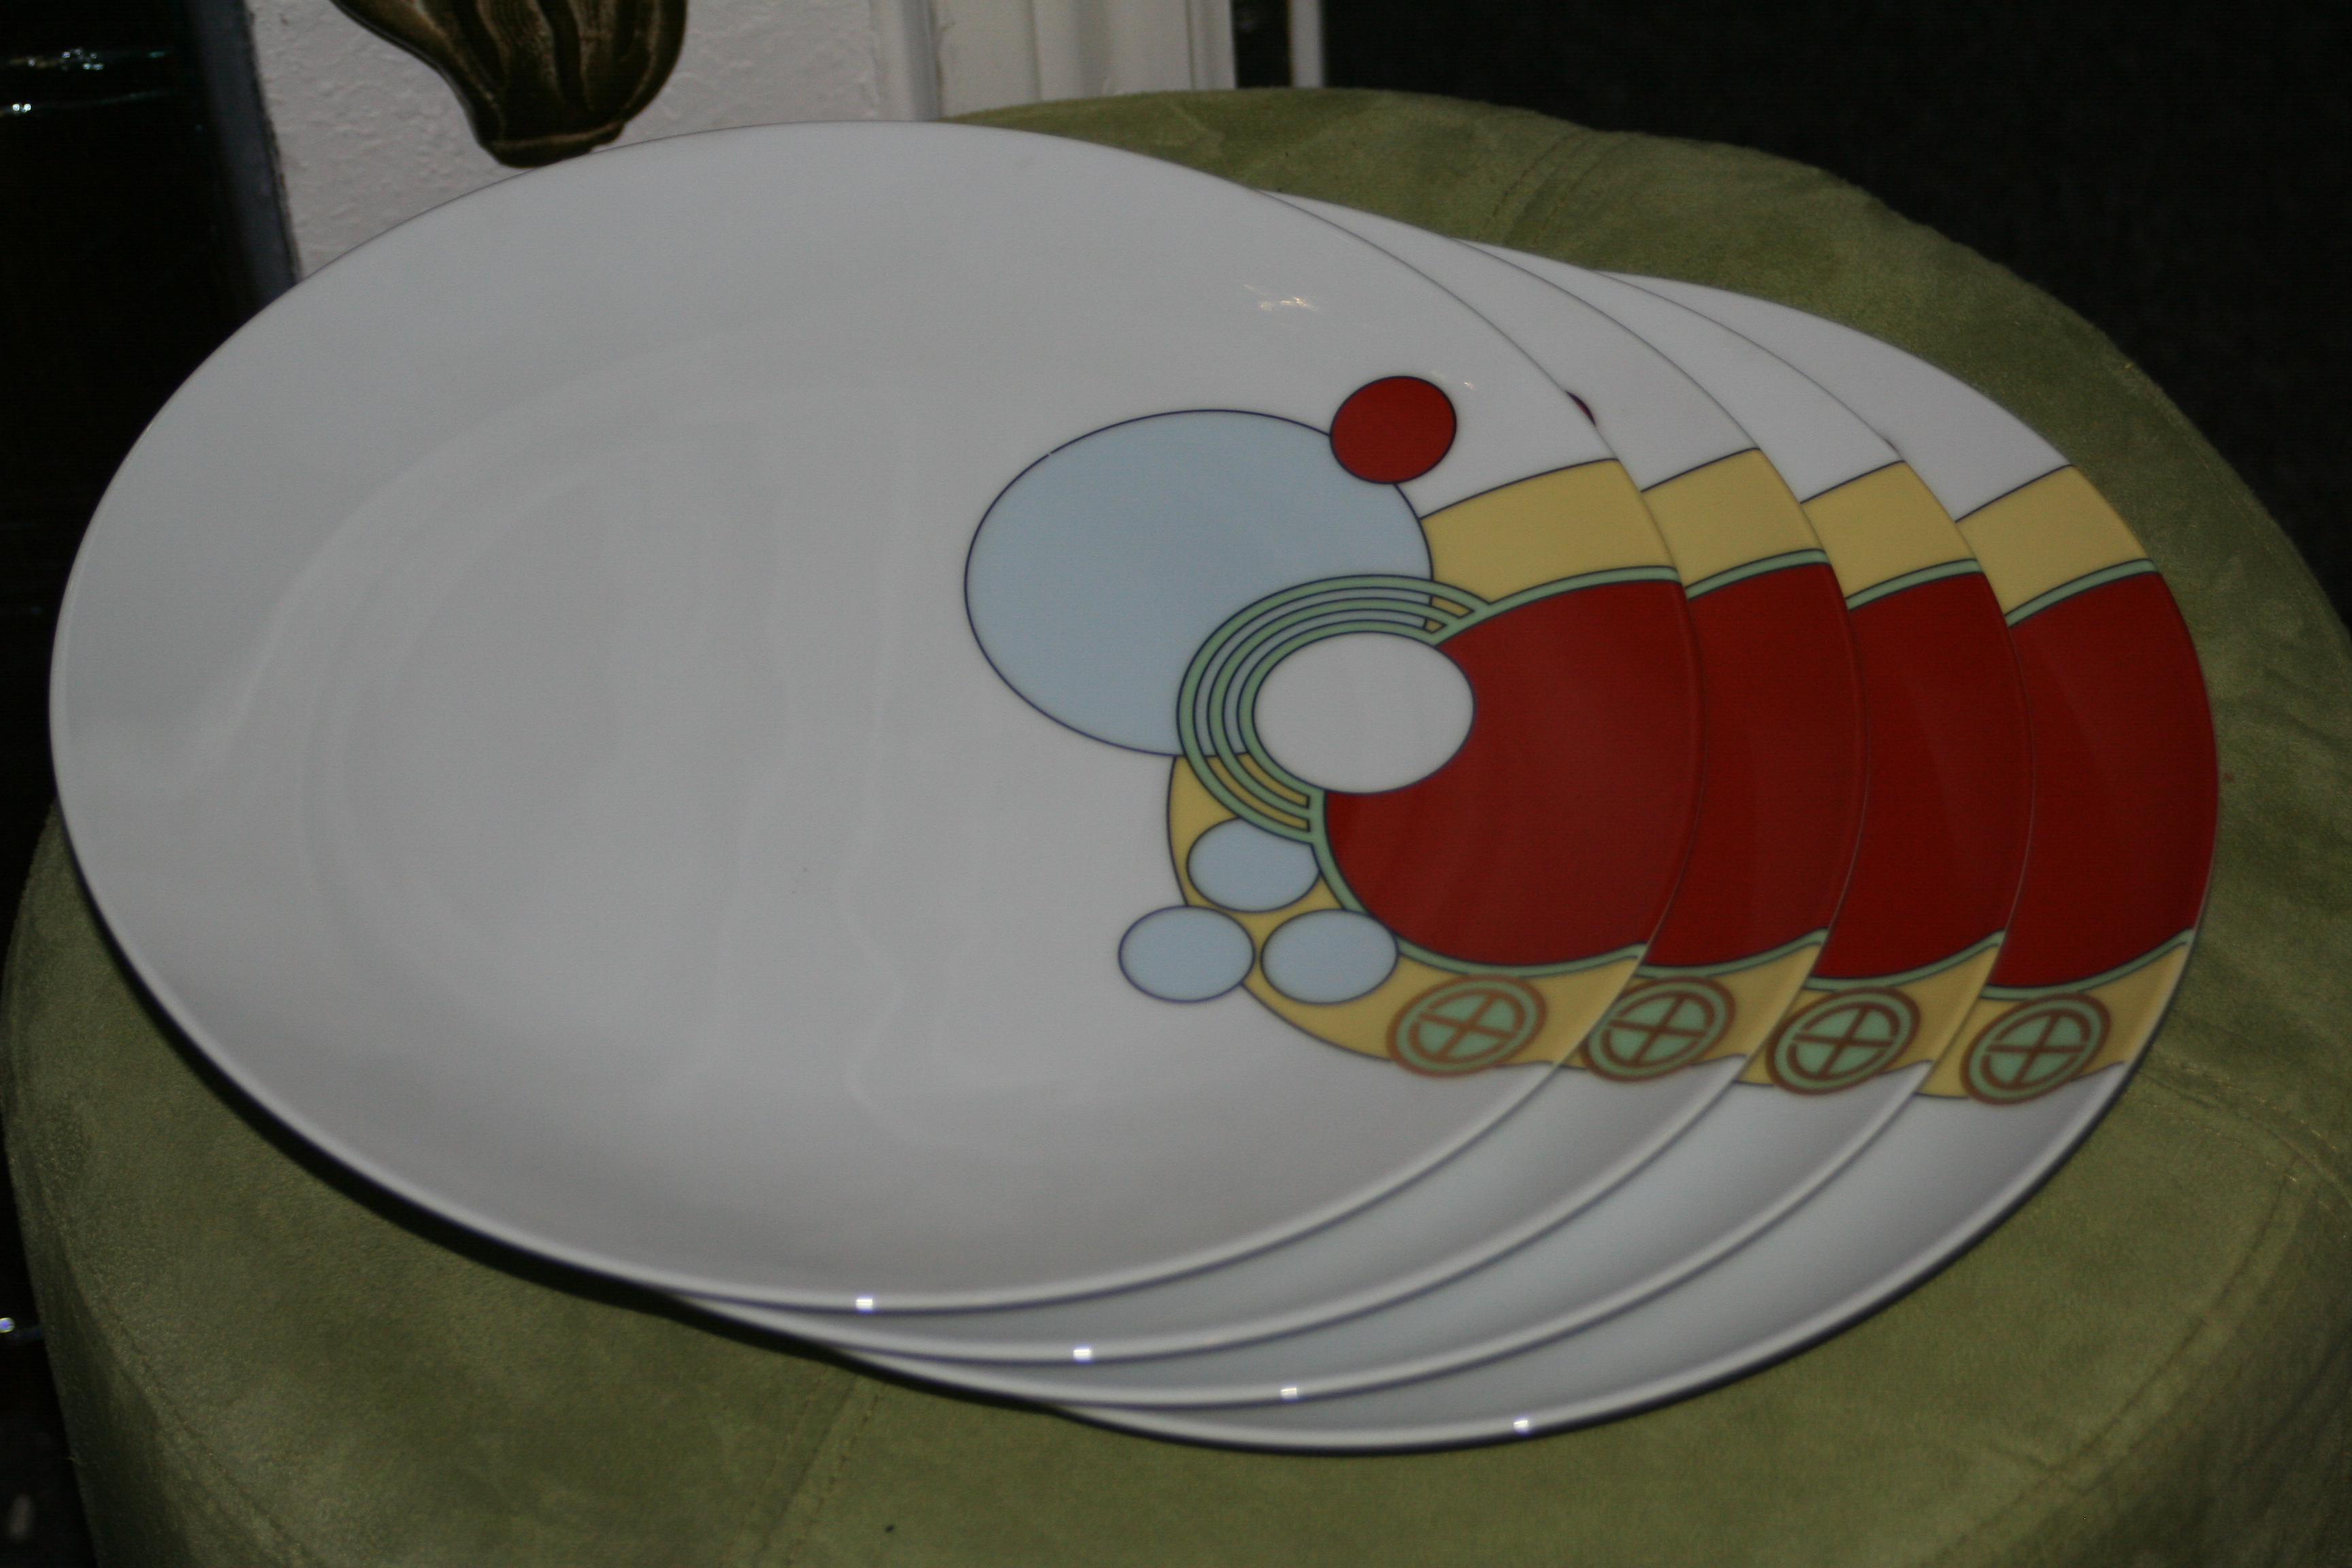 Frank Lloyd Wright for Noritake Imperial Hotel Dinnerware - 18 Pc. - Image 10 of  sc 1 st  Chairish & Frank Lloyd Wright for Noritake Imperial Hotel Dinnerware - 18 Pc ...